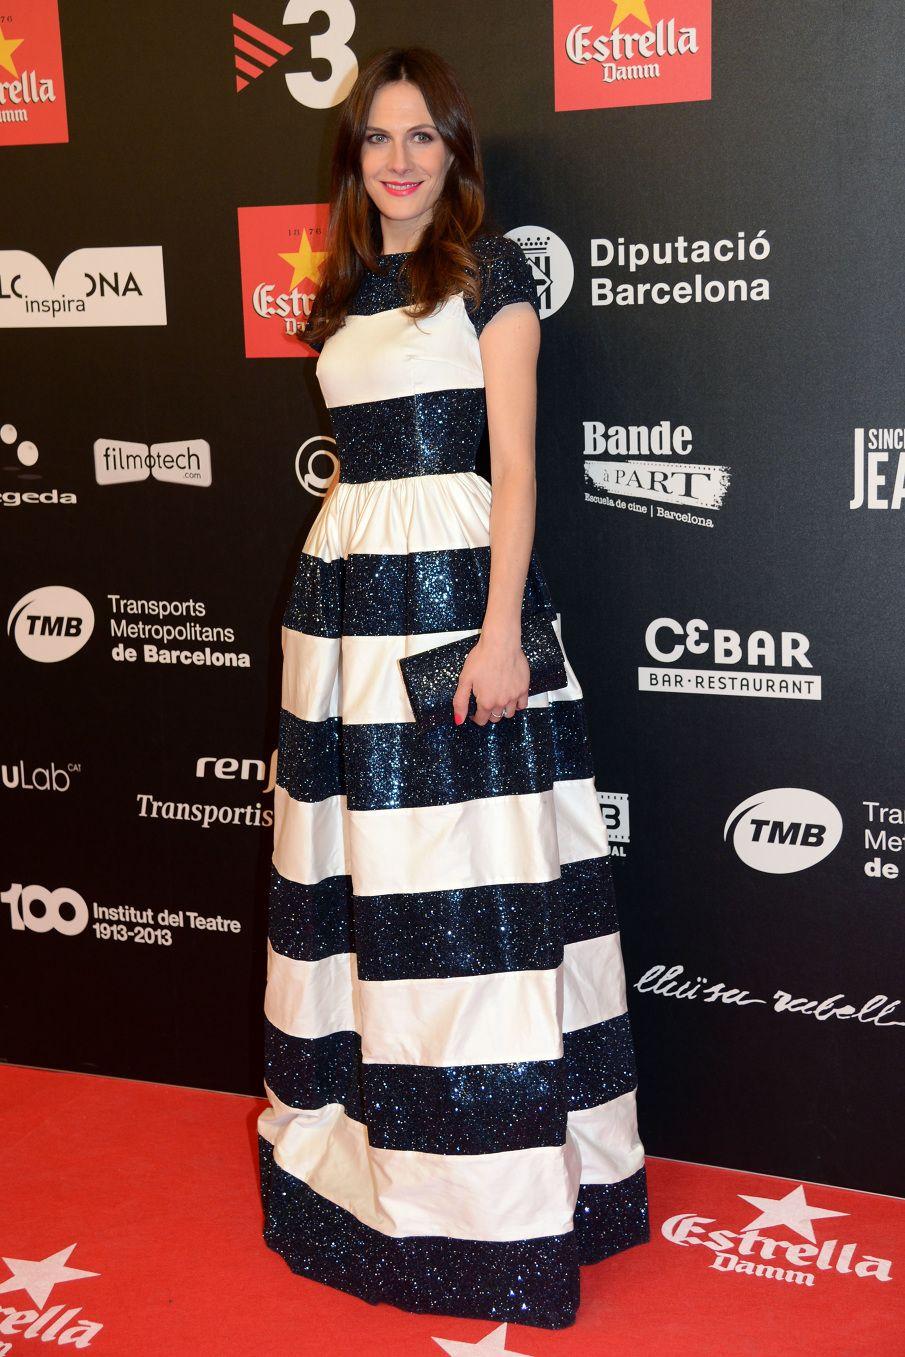 Belen Fabra bel�n fabra in juan pedro lopez - premis gaud� 2014 | bel�n